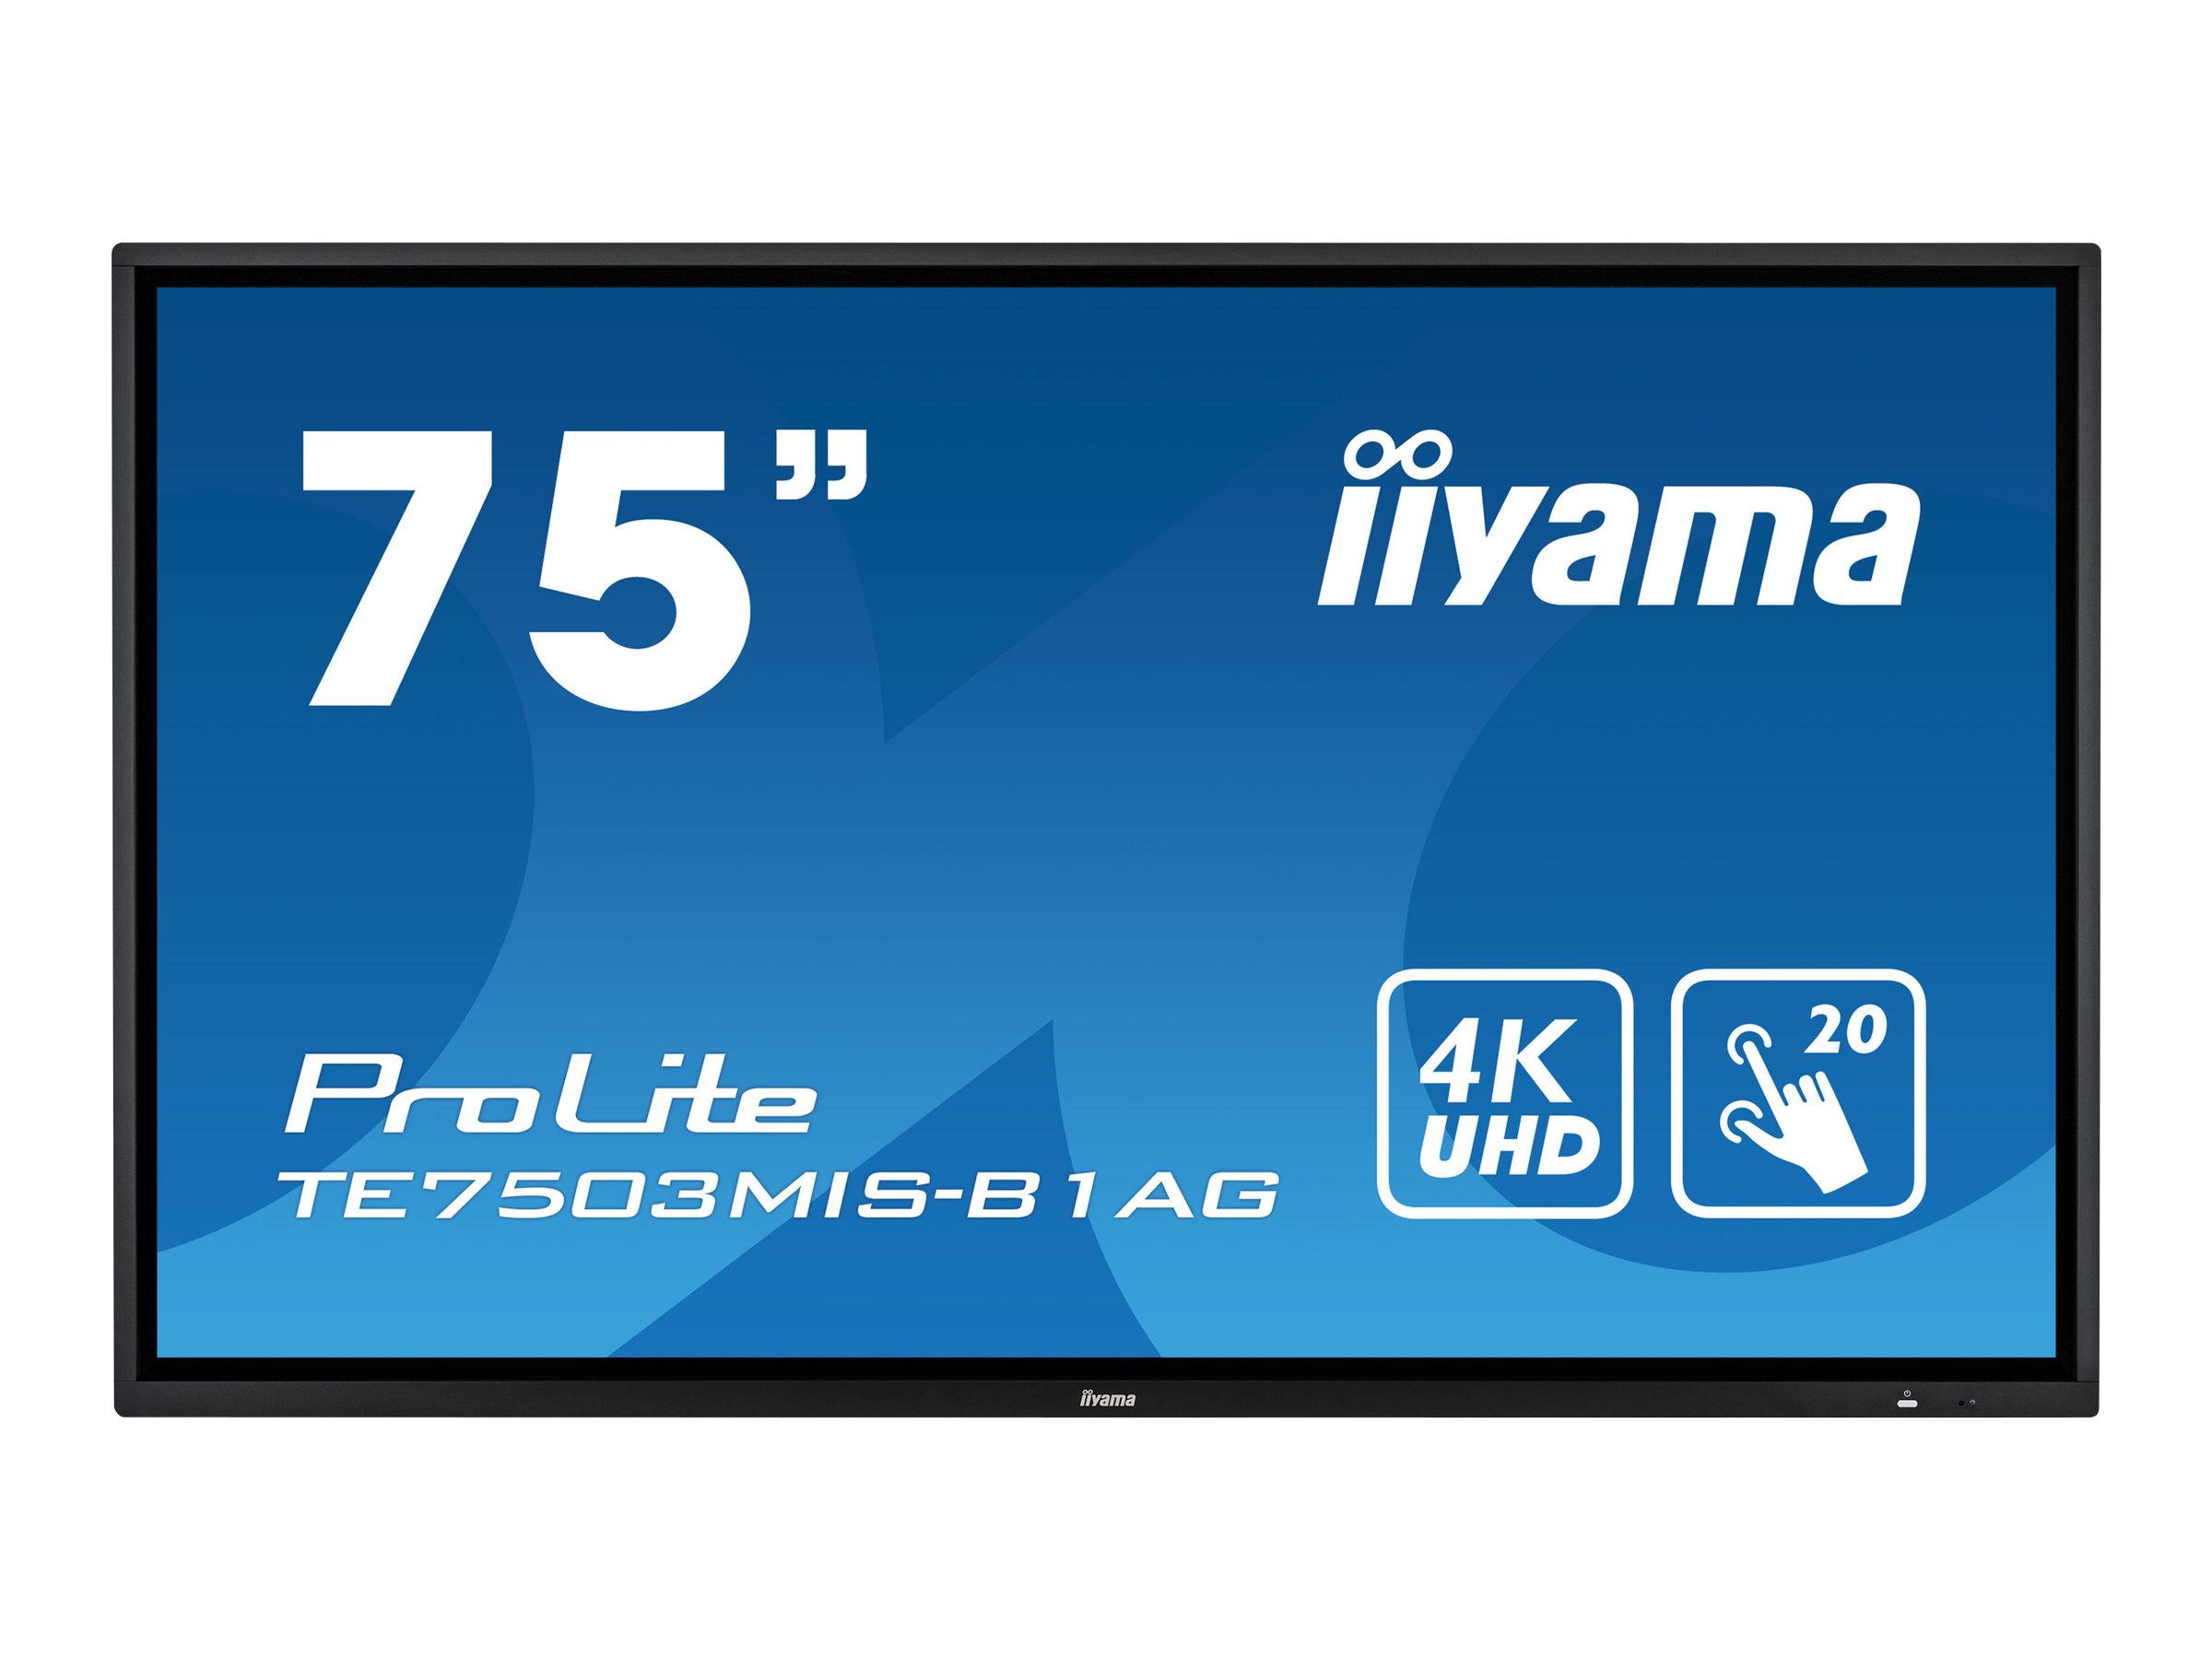 iiyama ProLite TE7503MIS-B1AG - 190.5 cm (75